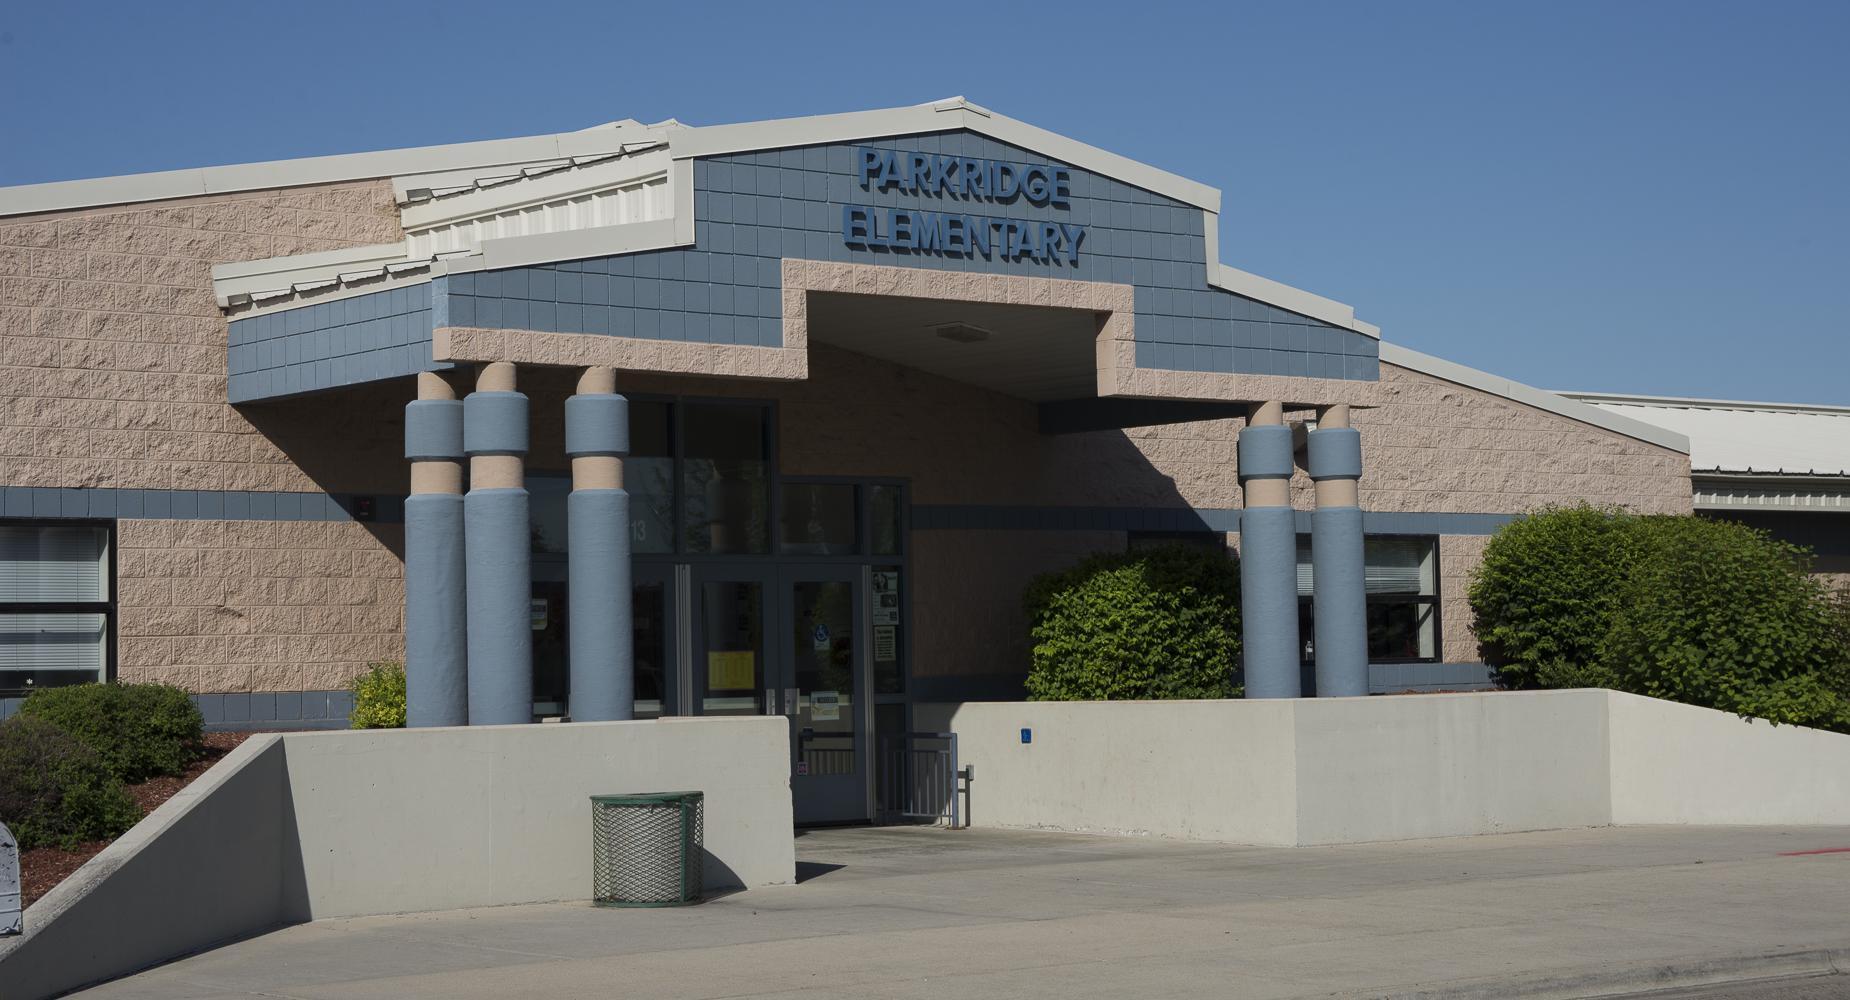 Park Ridge Elementary exterior.